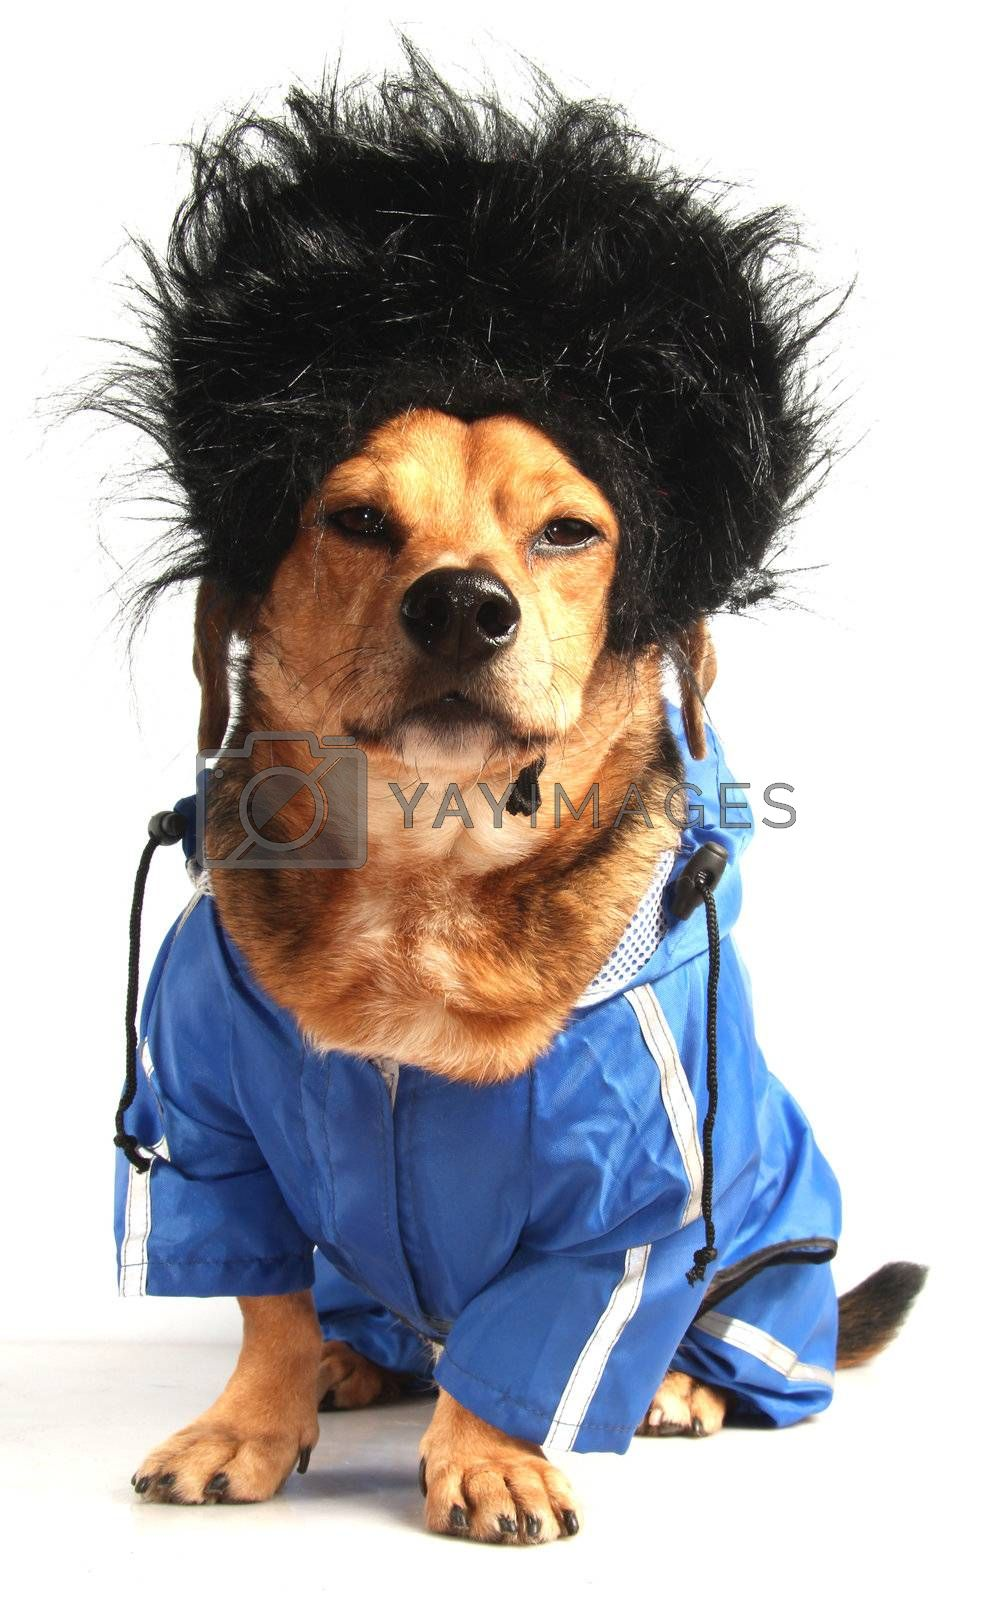 a dog have long black hair